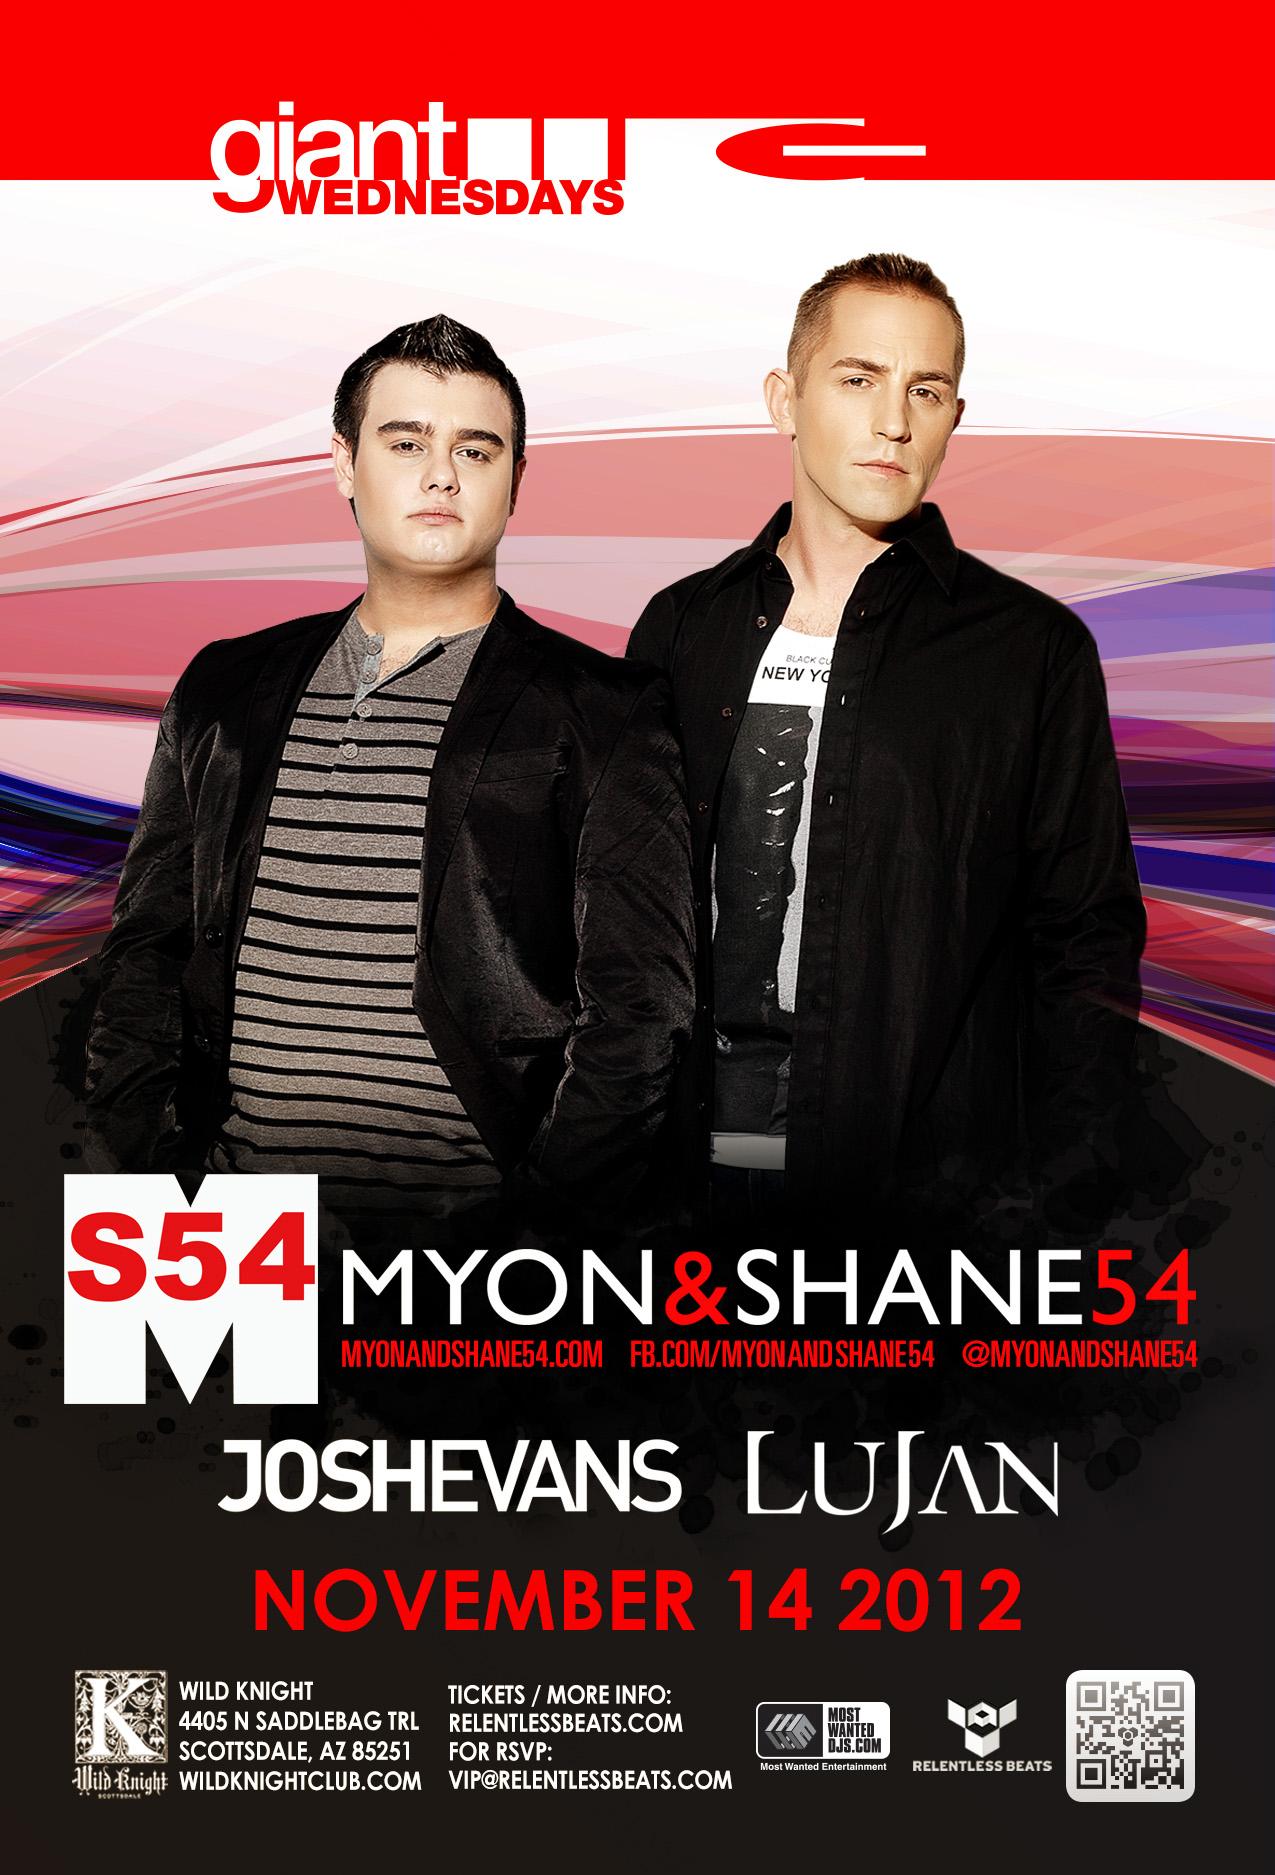 Myon and Shane 54 @ GIANT Wednesday on 11/14/12